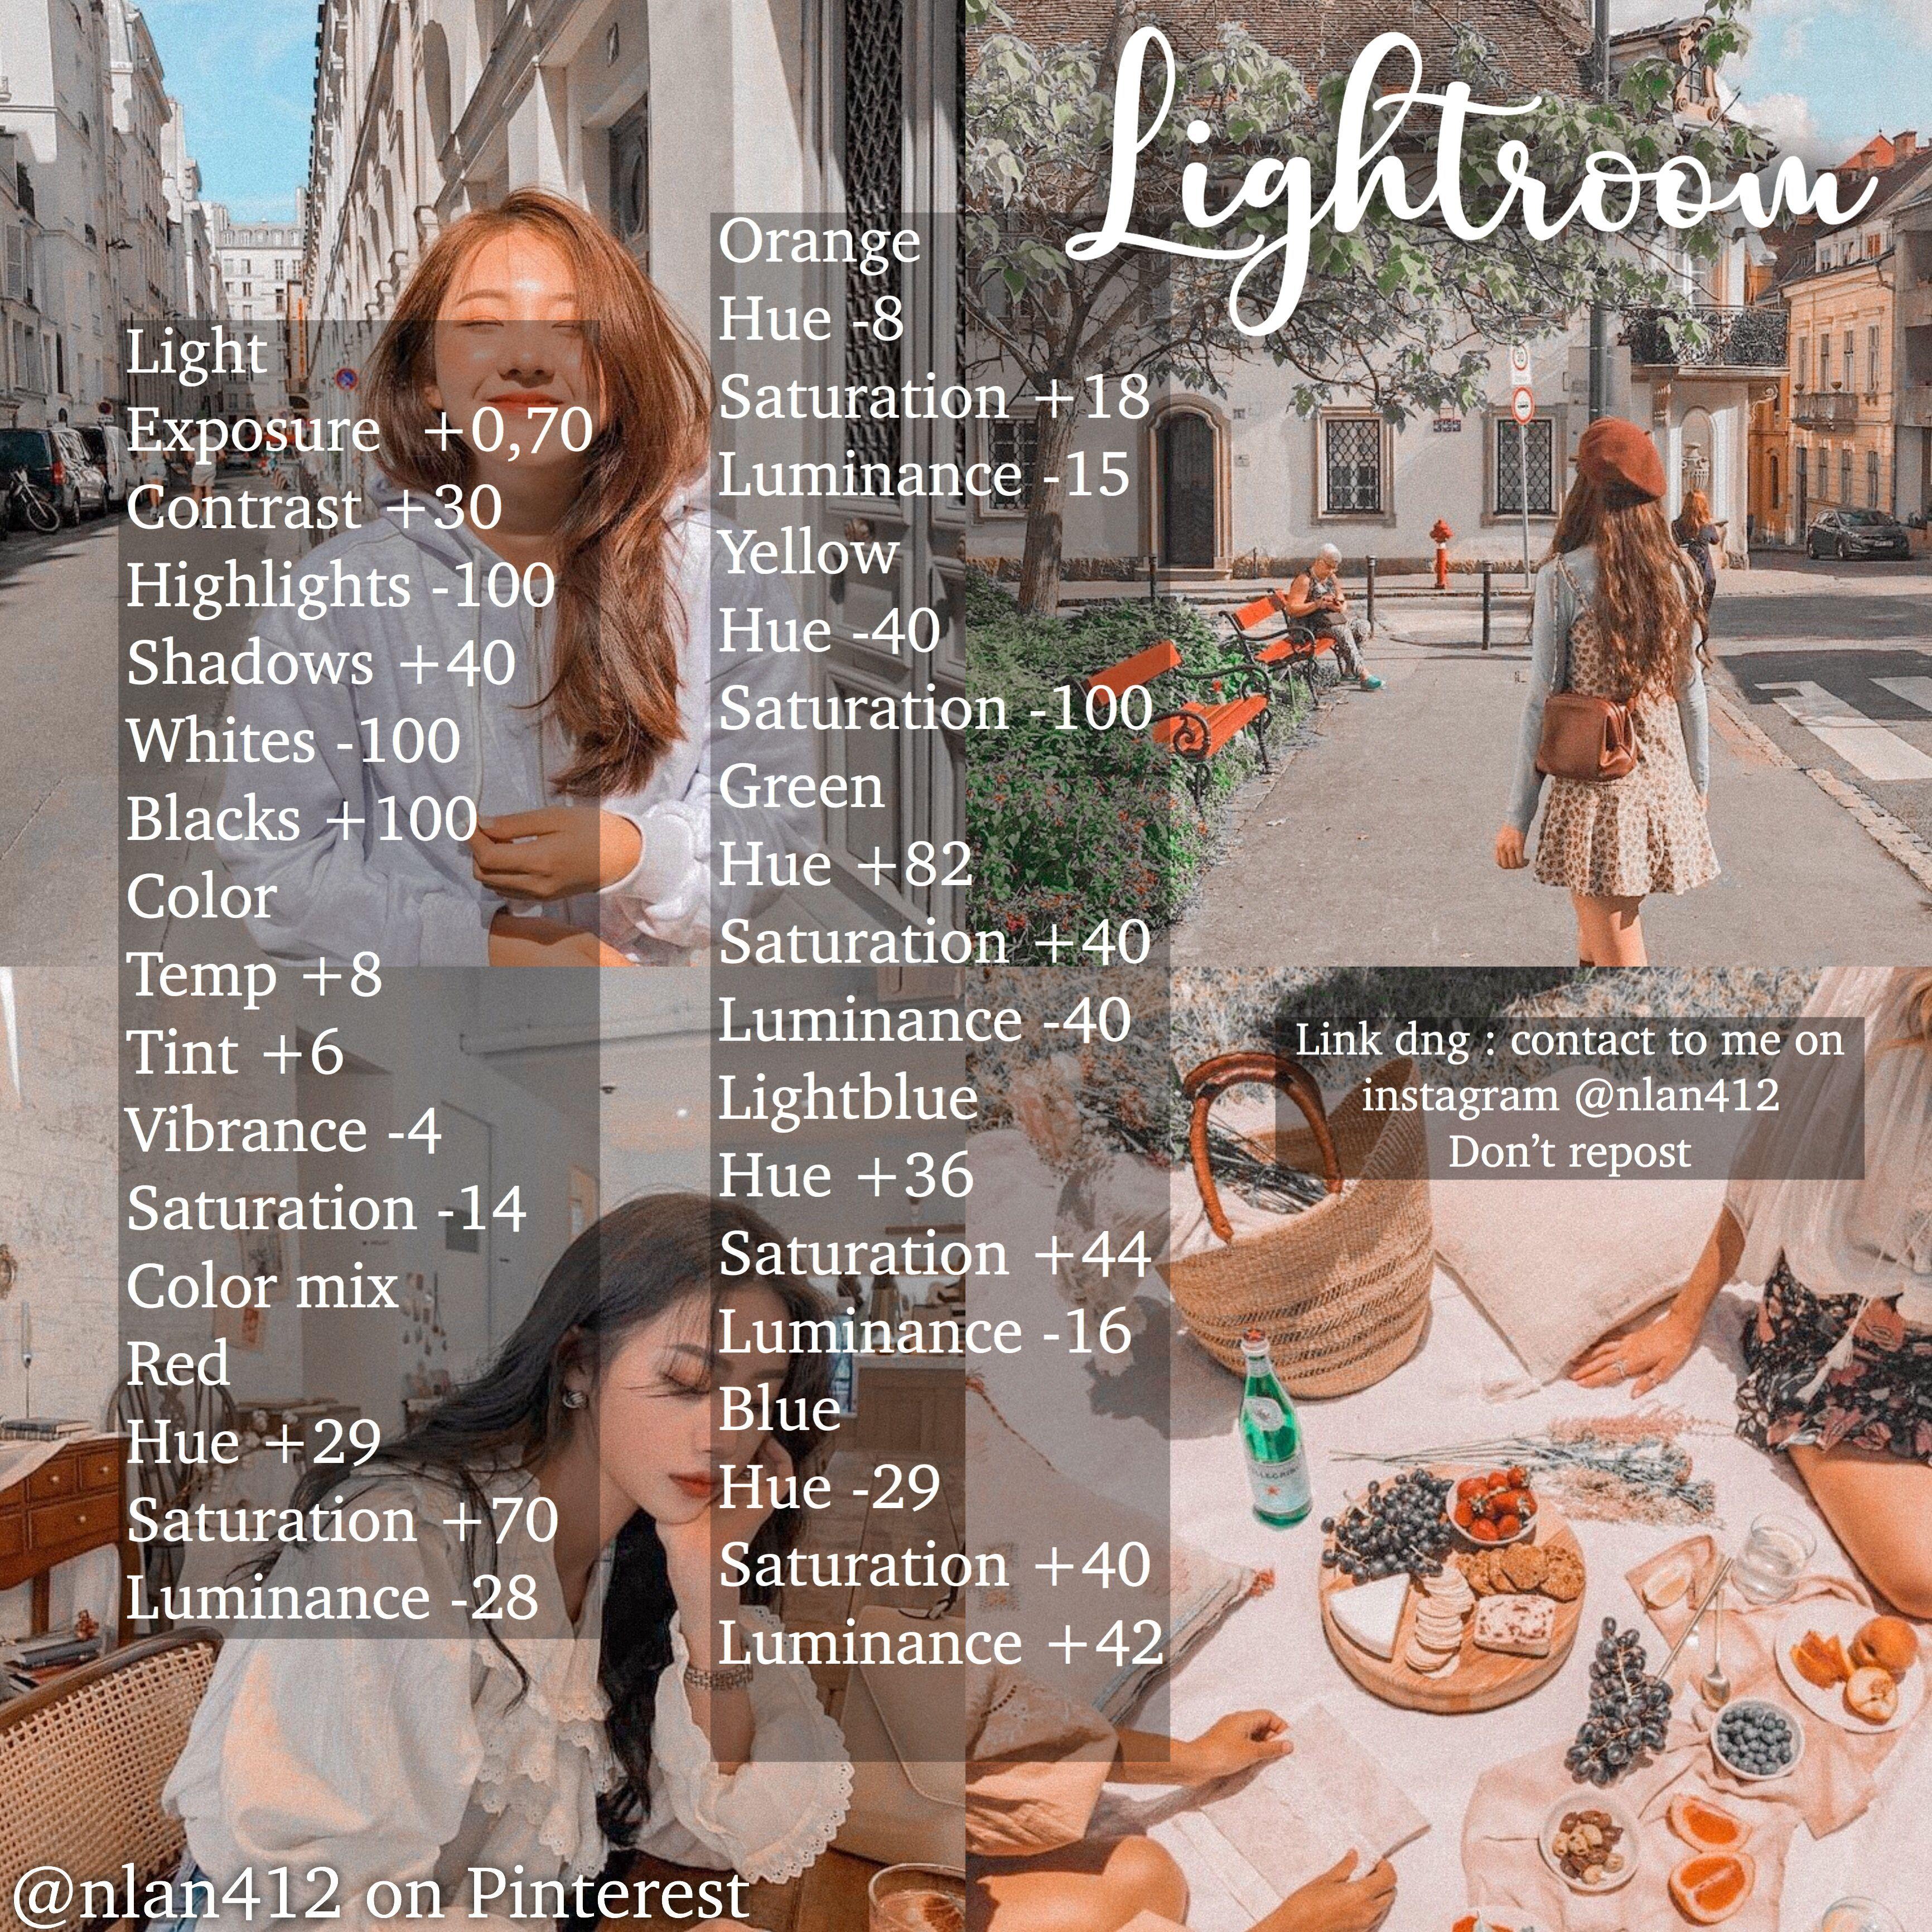 Lightroom Save Follow Me Online Photo Editing Online Photo In 2020 Lightroom Editing Tutorials Lightroom Tutorial Photo Editing Adobe Lightroom Photo Editing